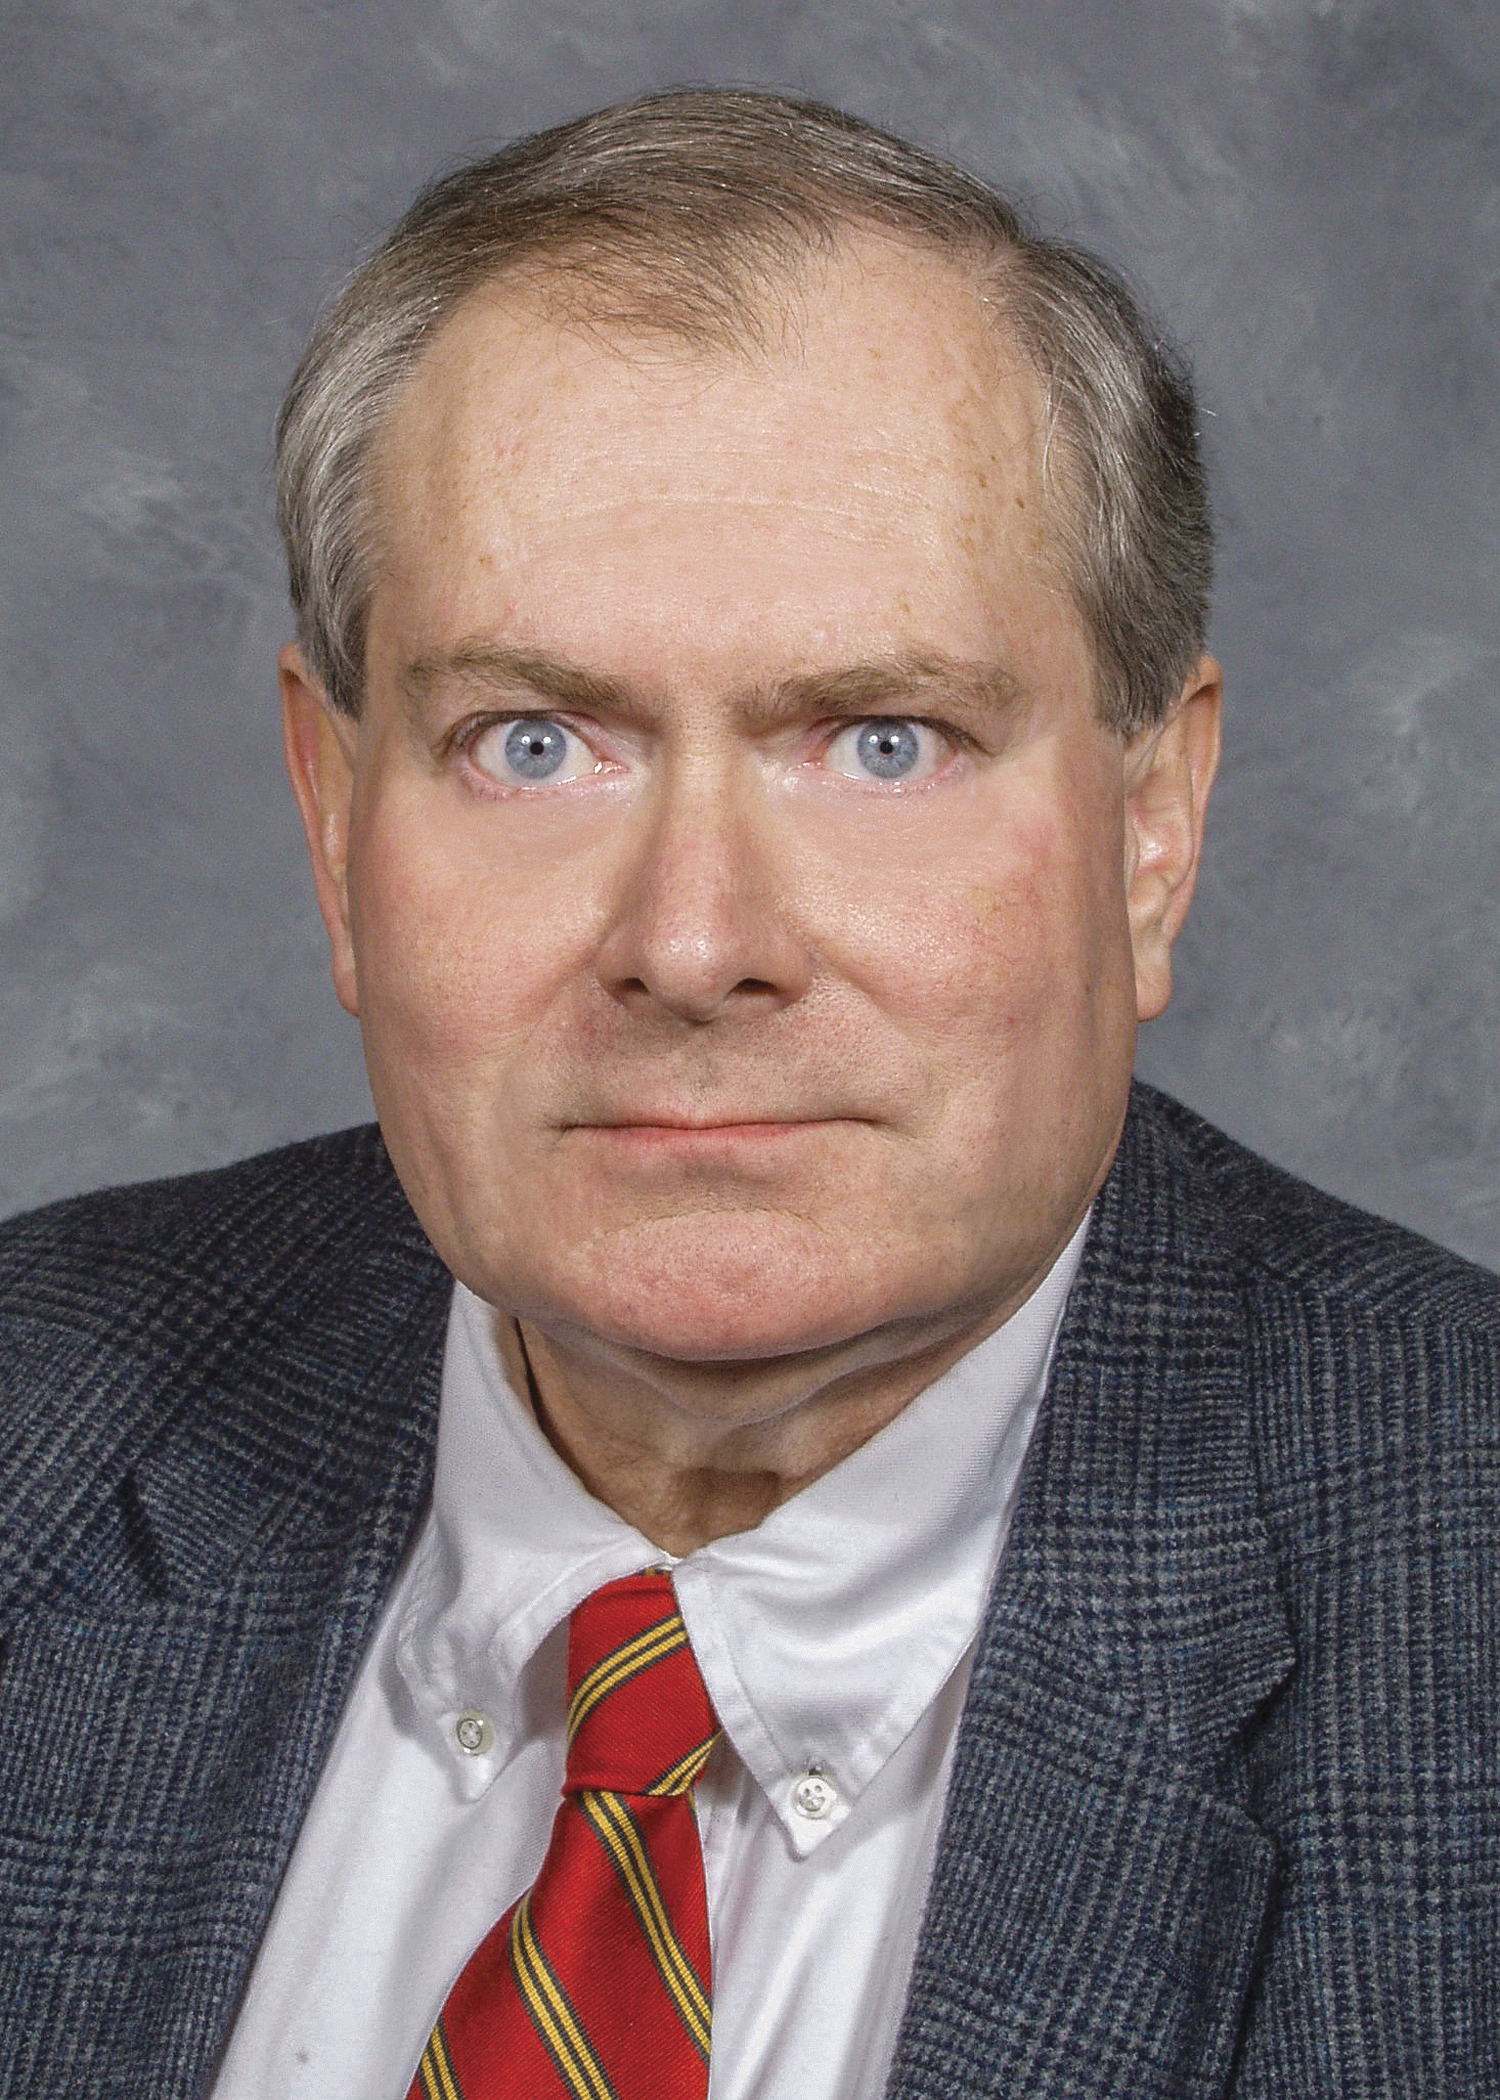 William B. Ruger Jr. headshot